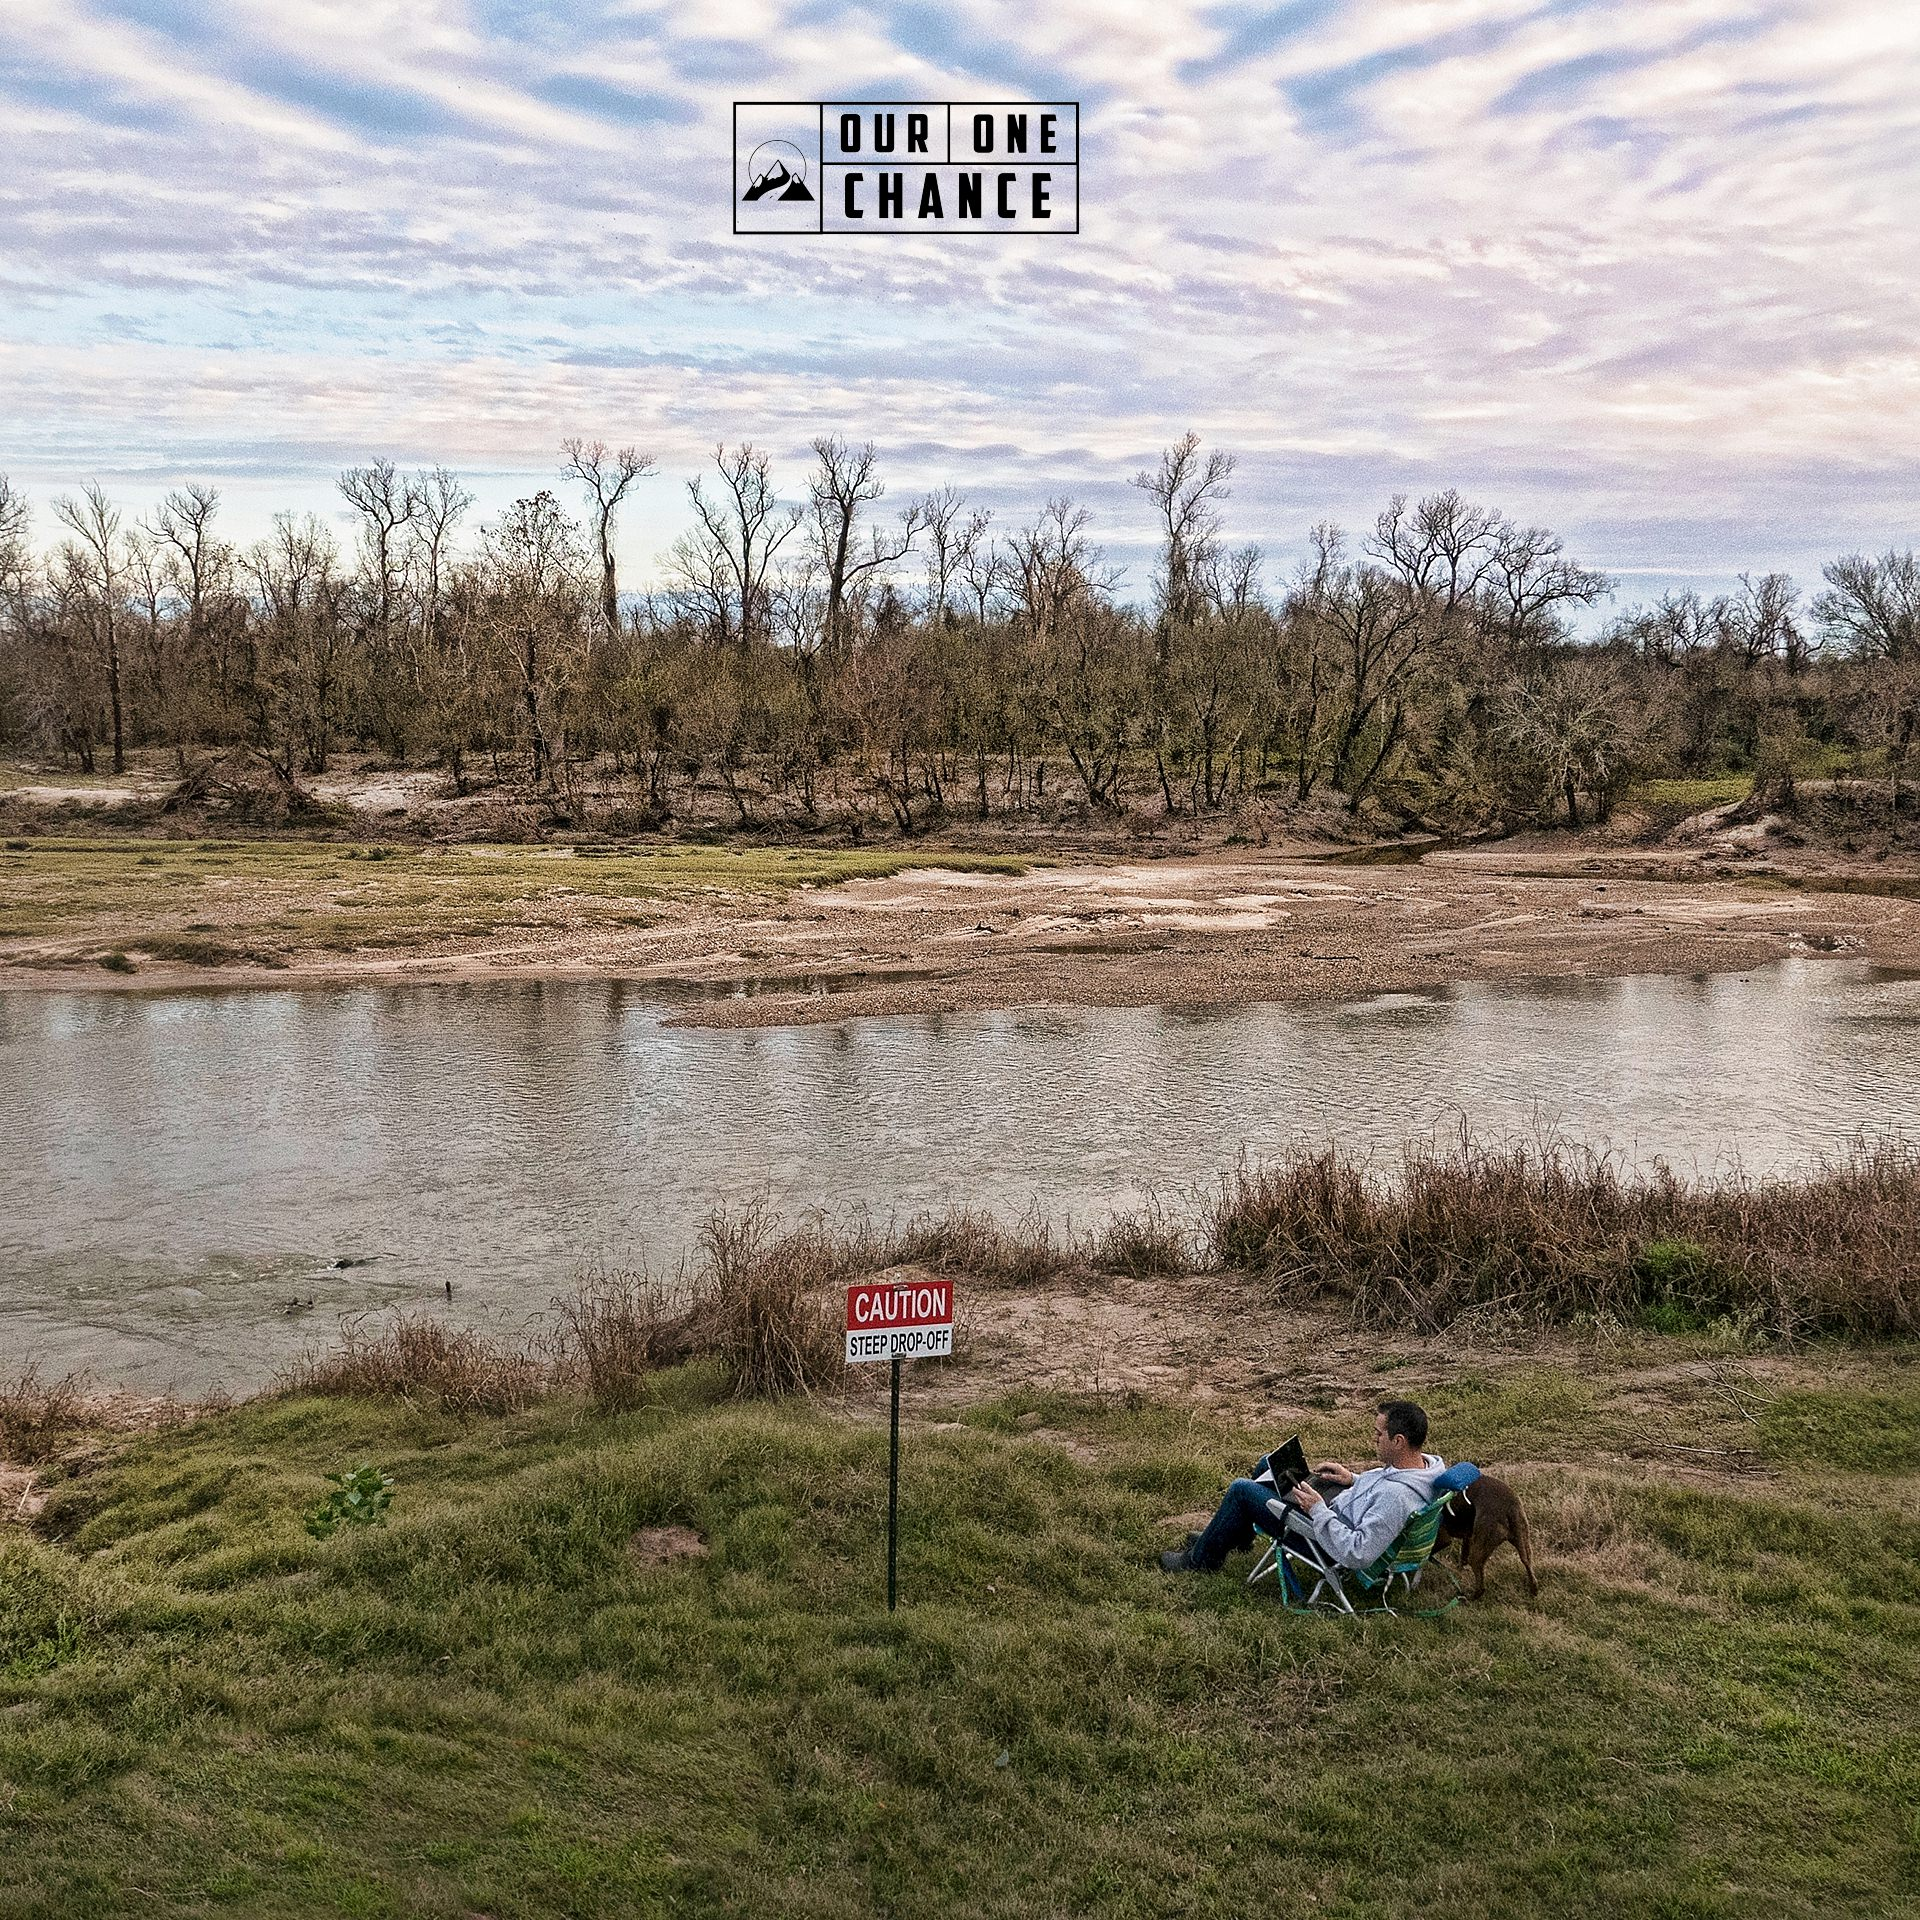 RV Across the Country Texas_0042